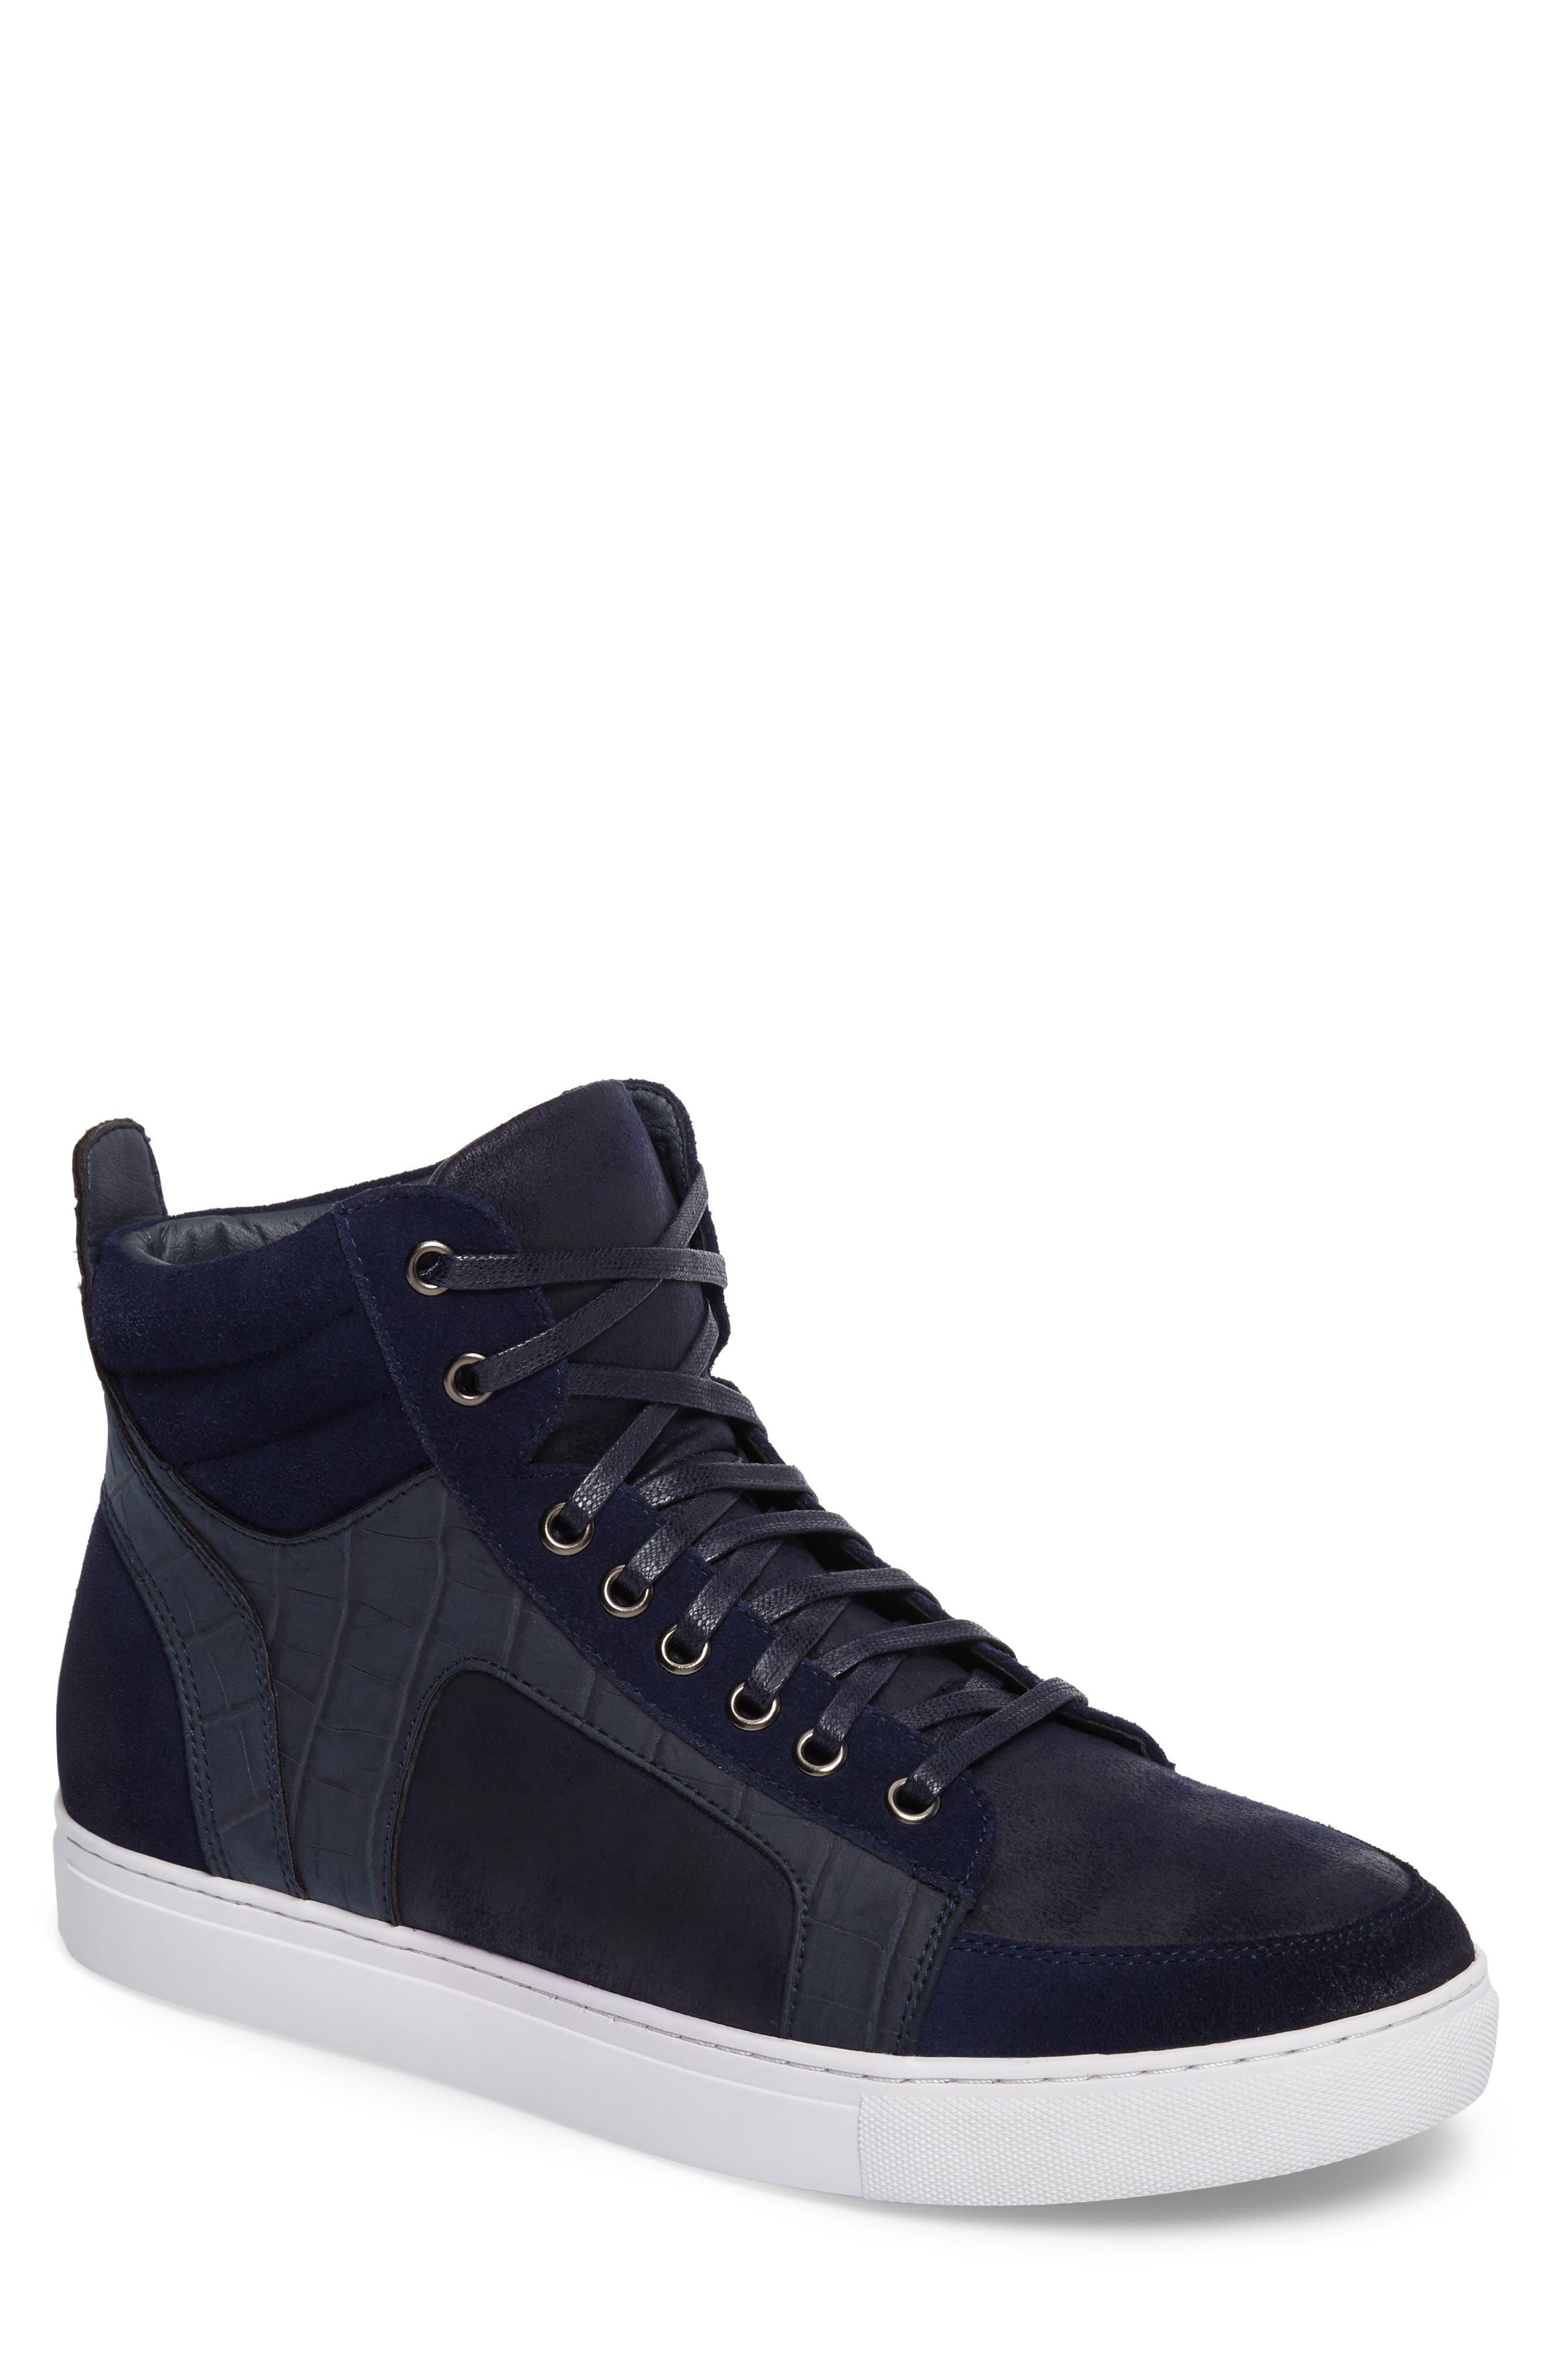 Makin Sneaker,                         Main,                         color, Navy Suede